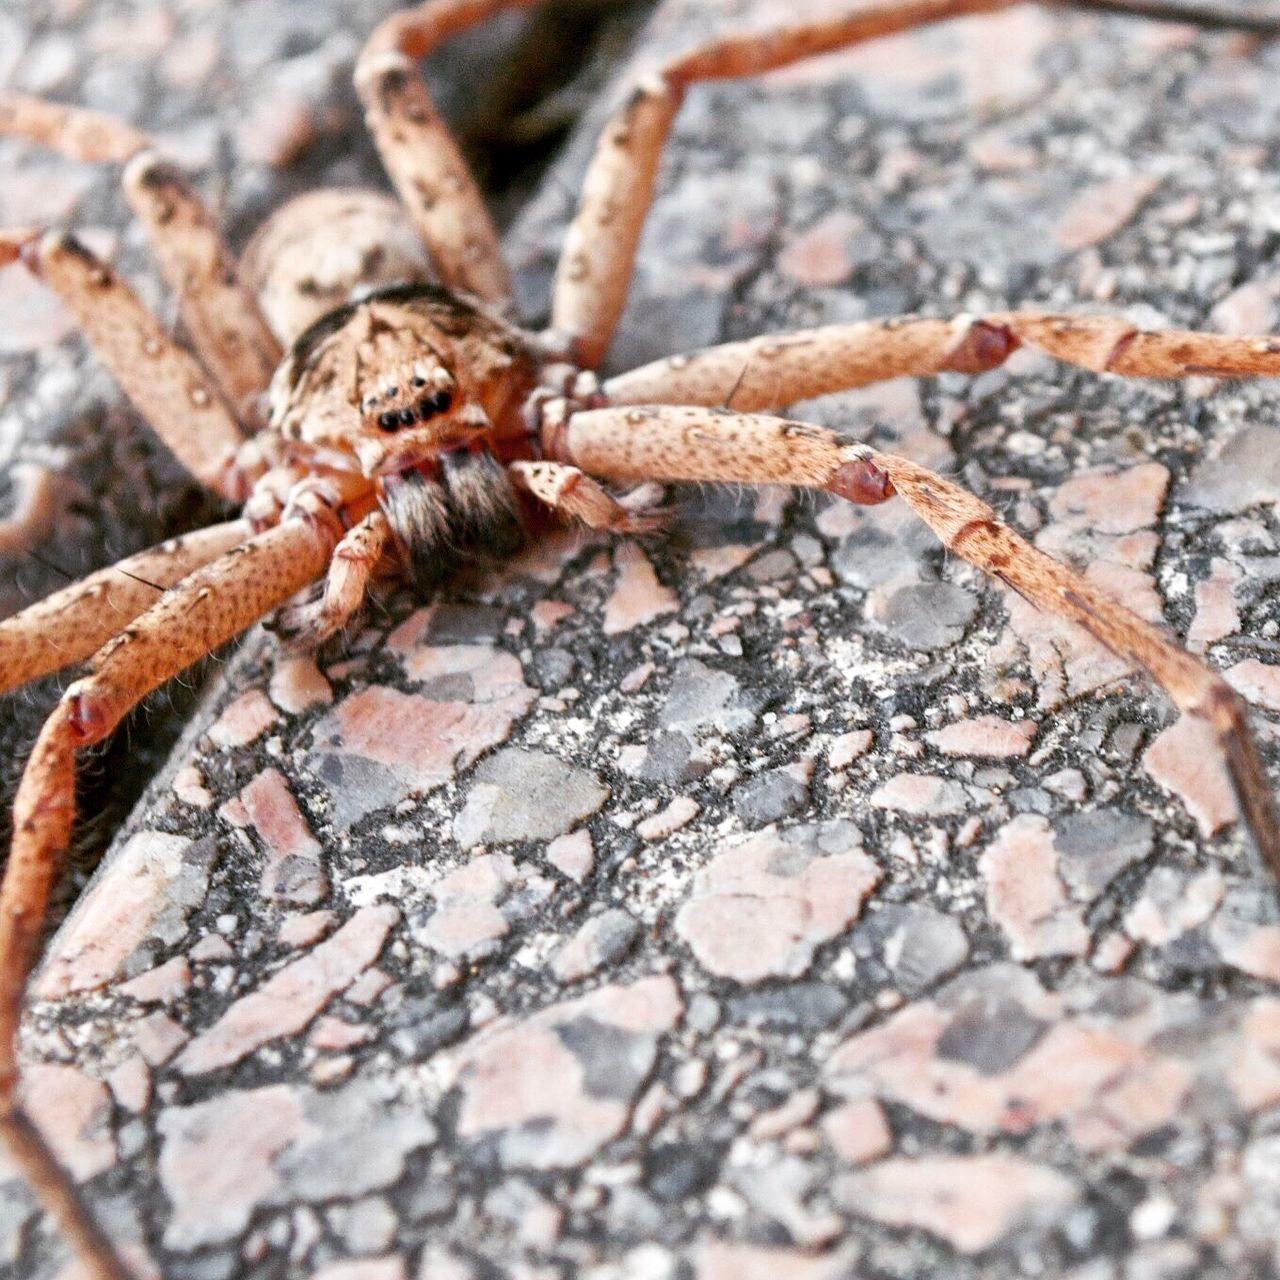 Huntsman HuntsmanSpider Eightleggedfreaks Spider Incy Wincy First Eyeem Photo